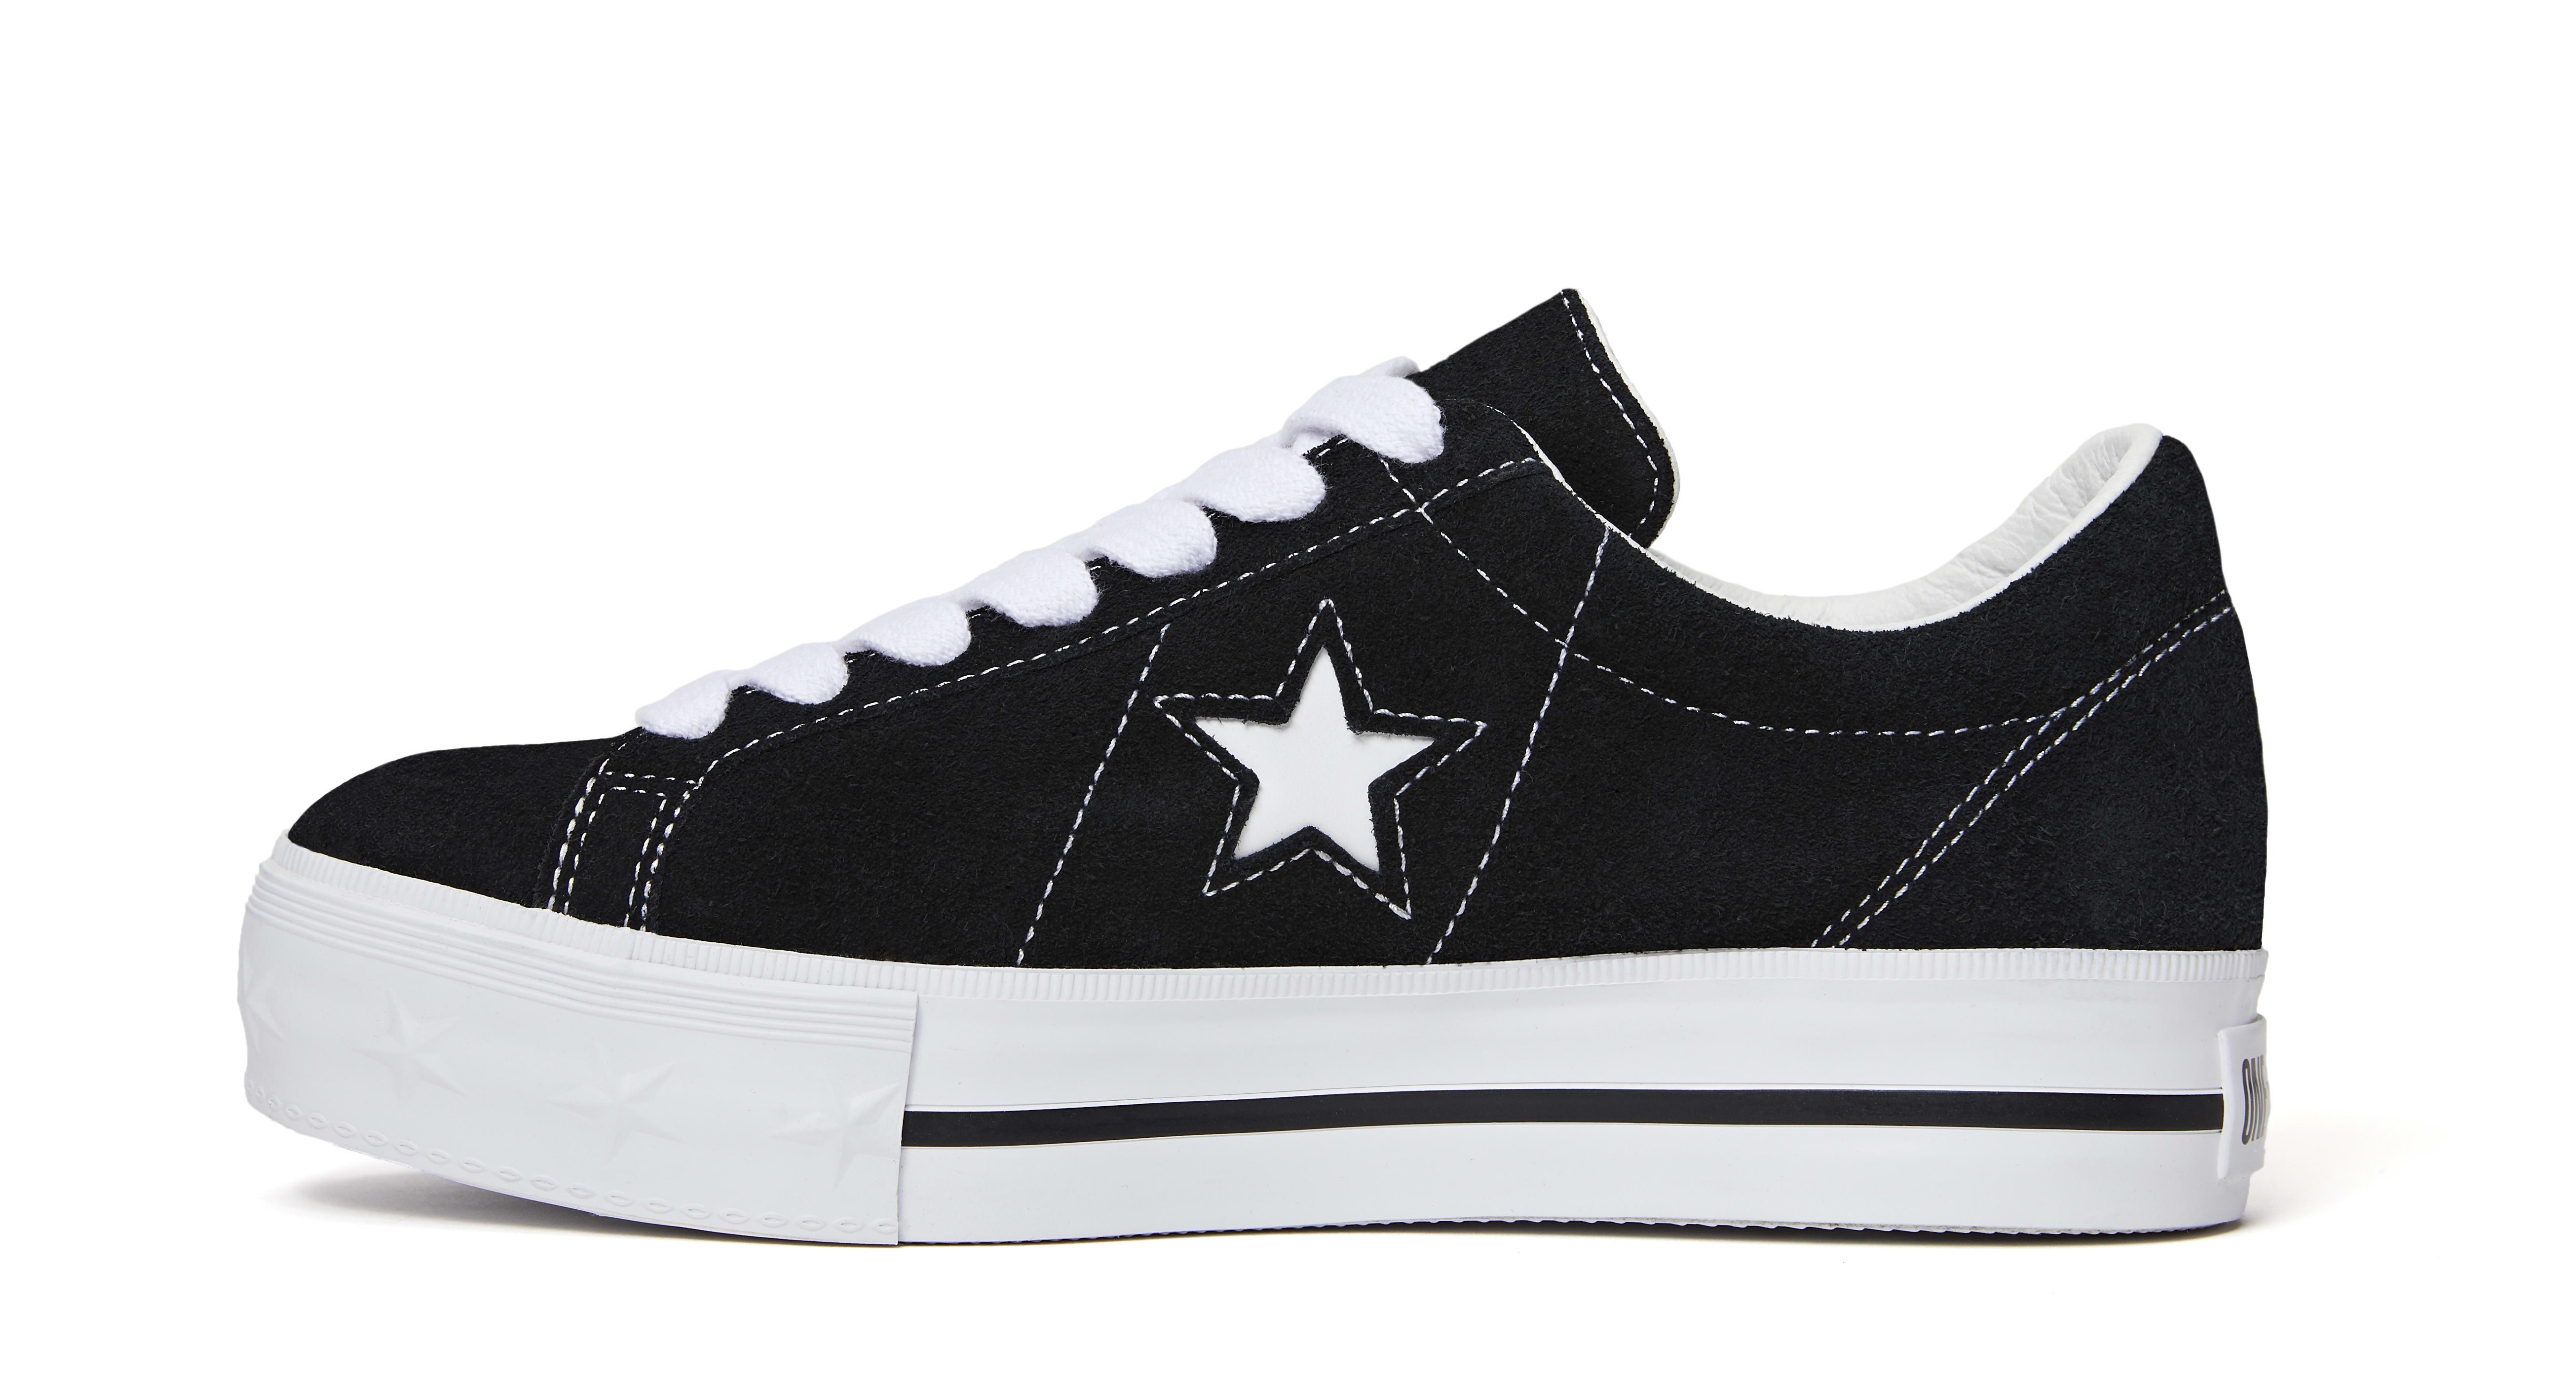 Mademe x Converse One Star 'Black' (Medial)